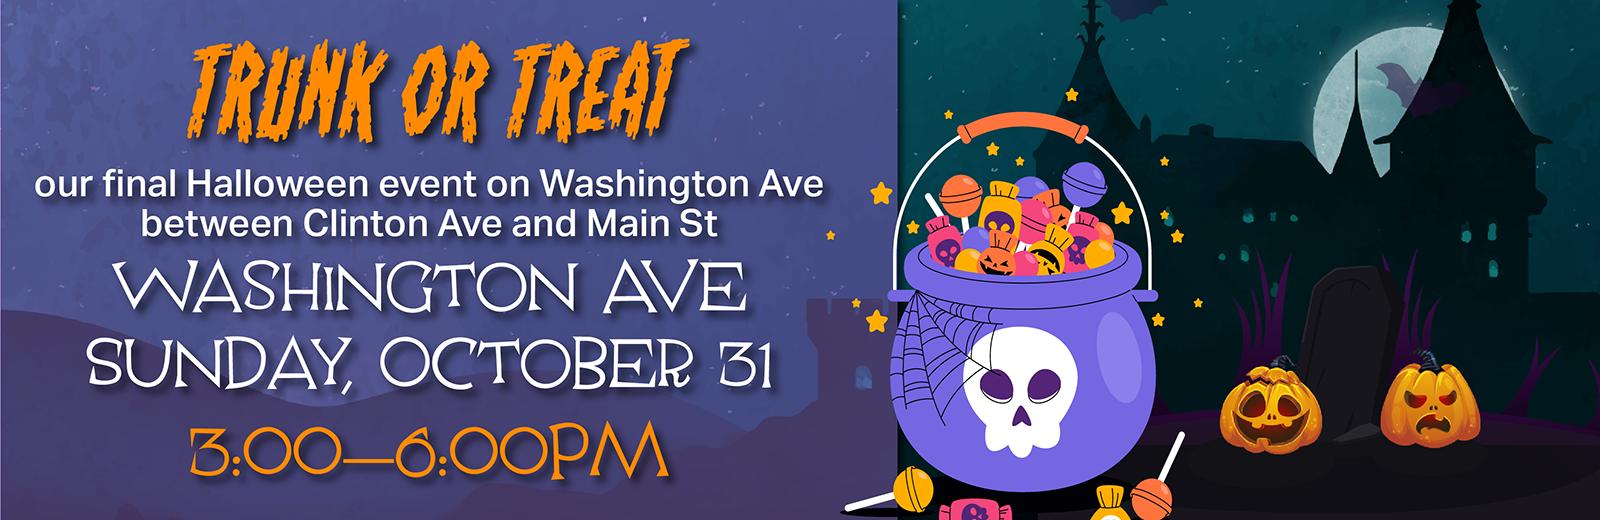 halloween-trunk-or-treat_2021